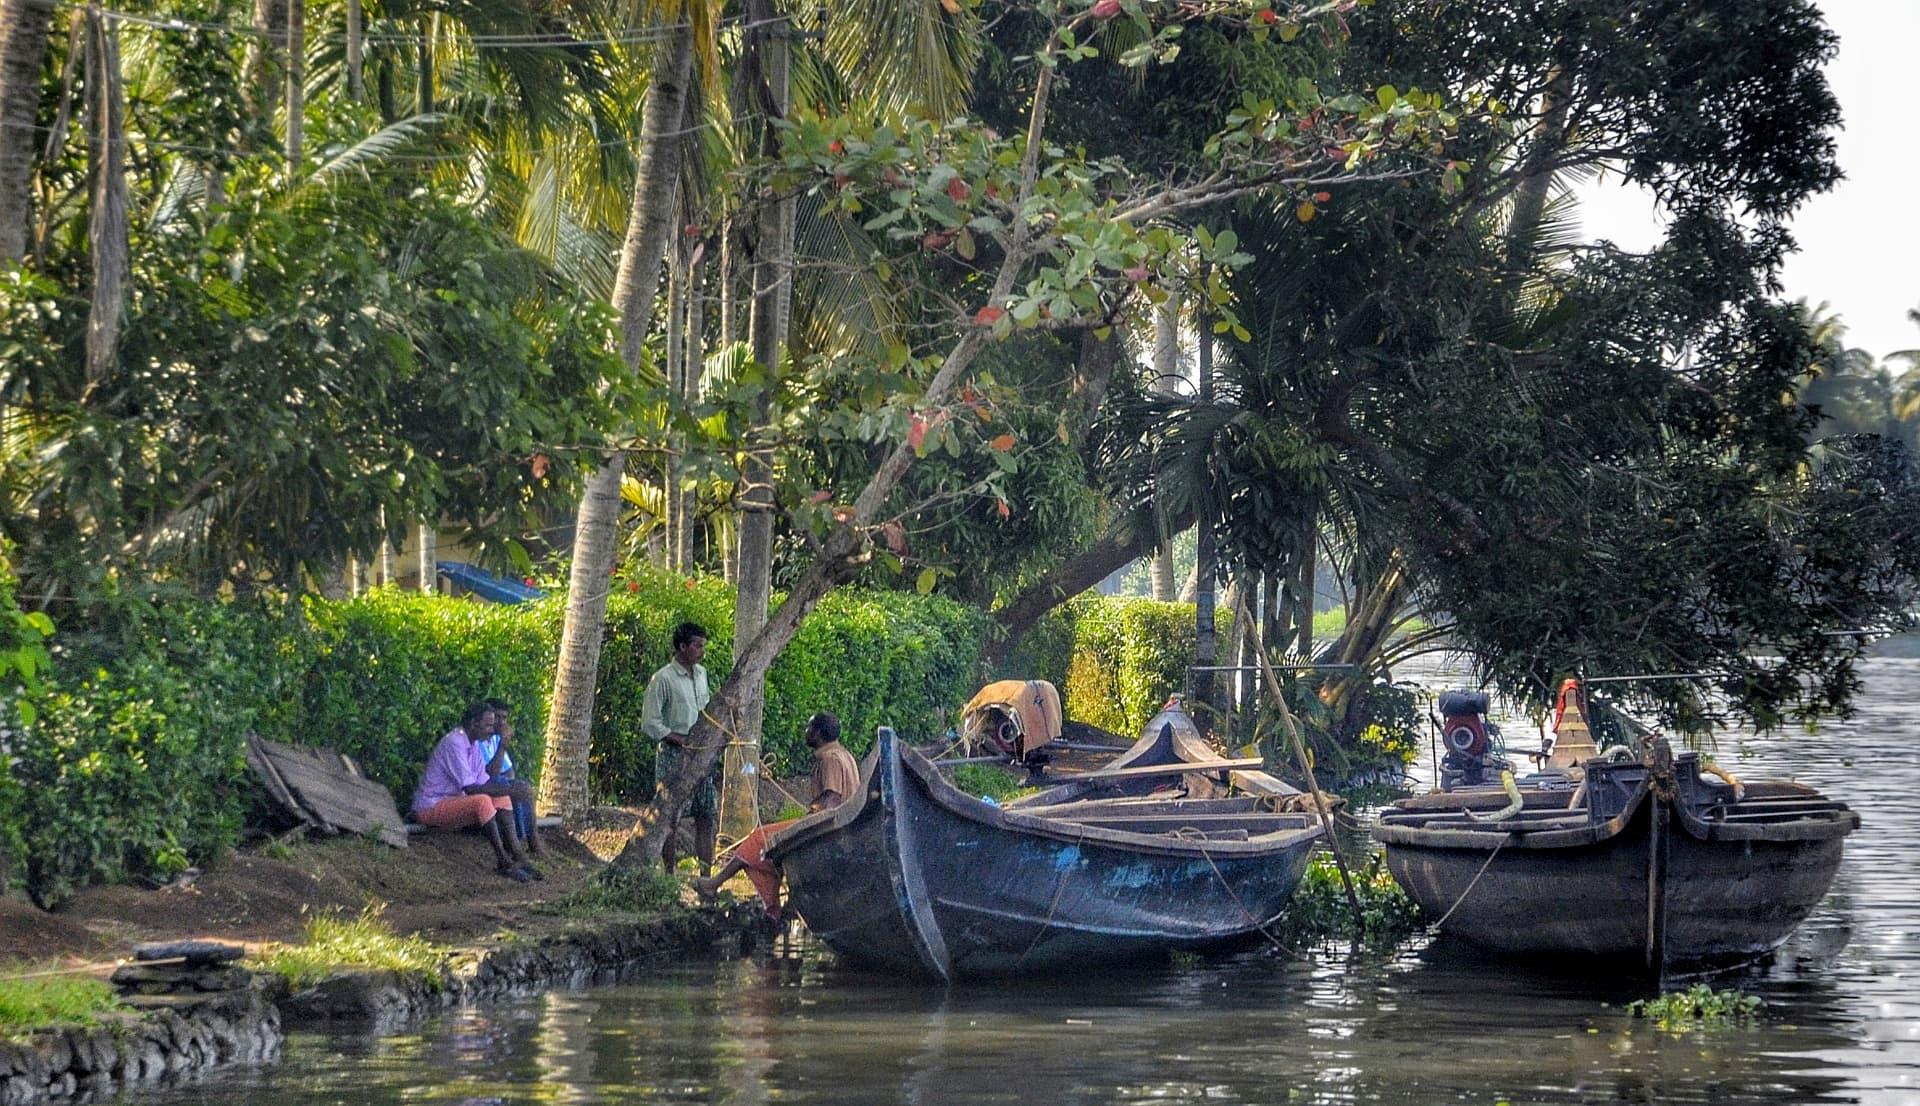 adventour - India - Kerala backwaters